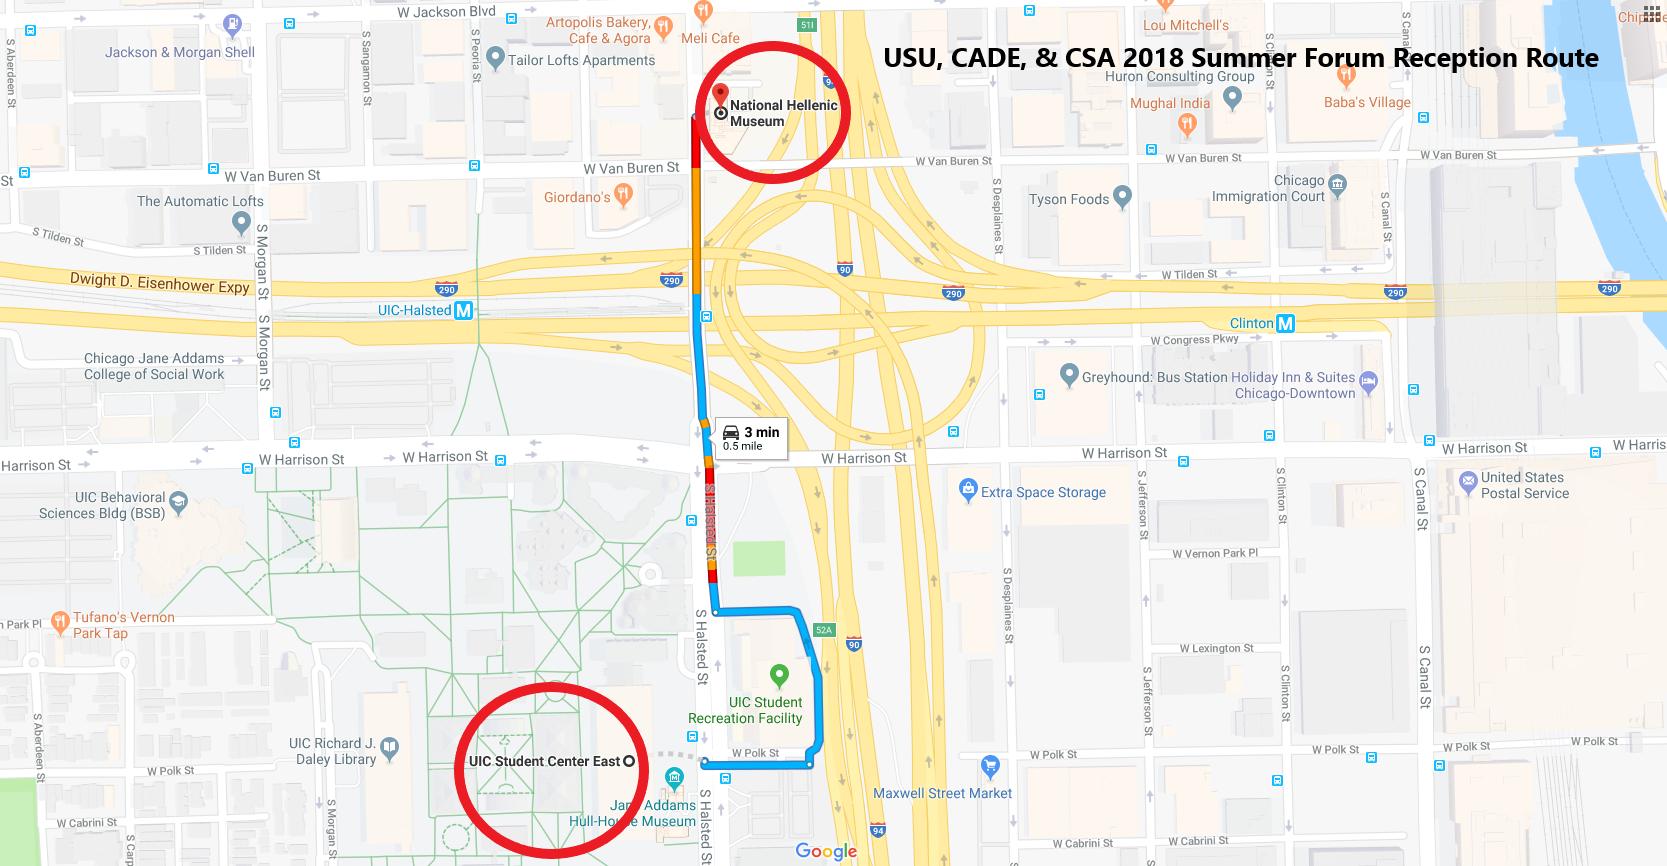 Shuttle Map Summer 2018 Reception Route (002)